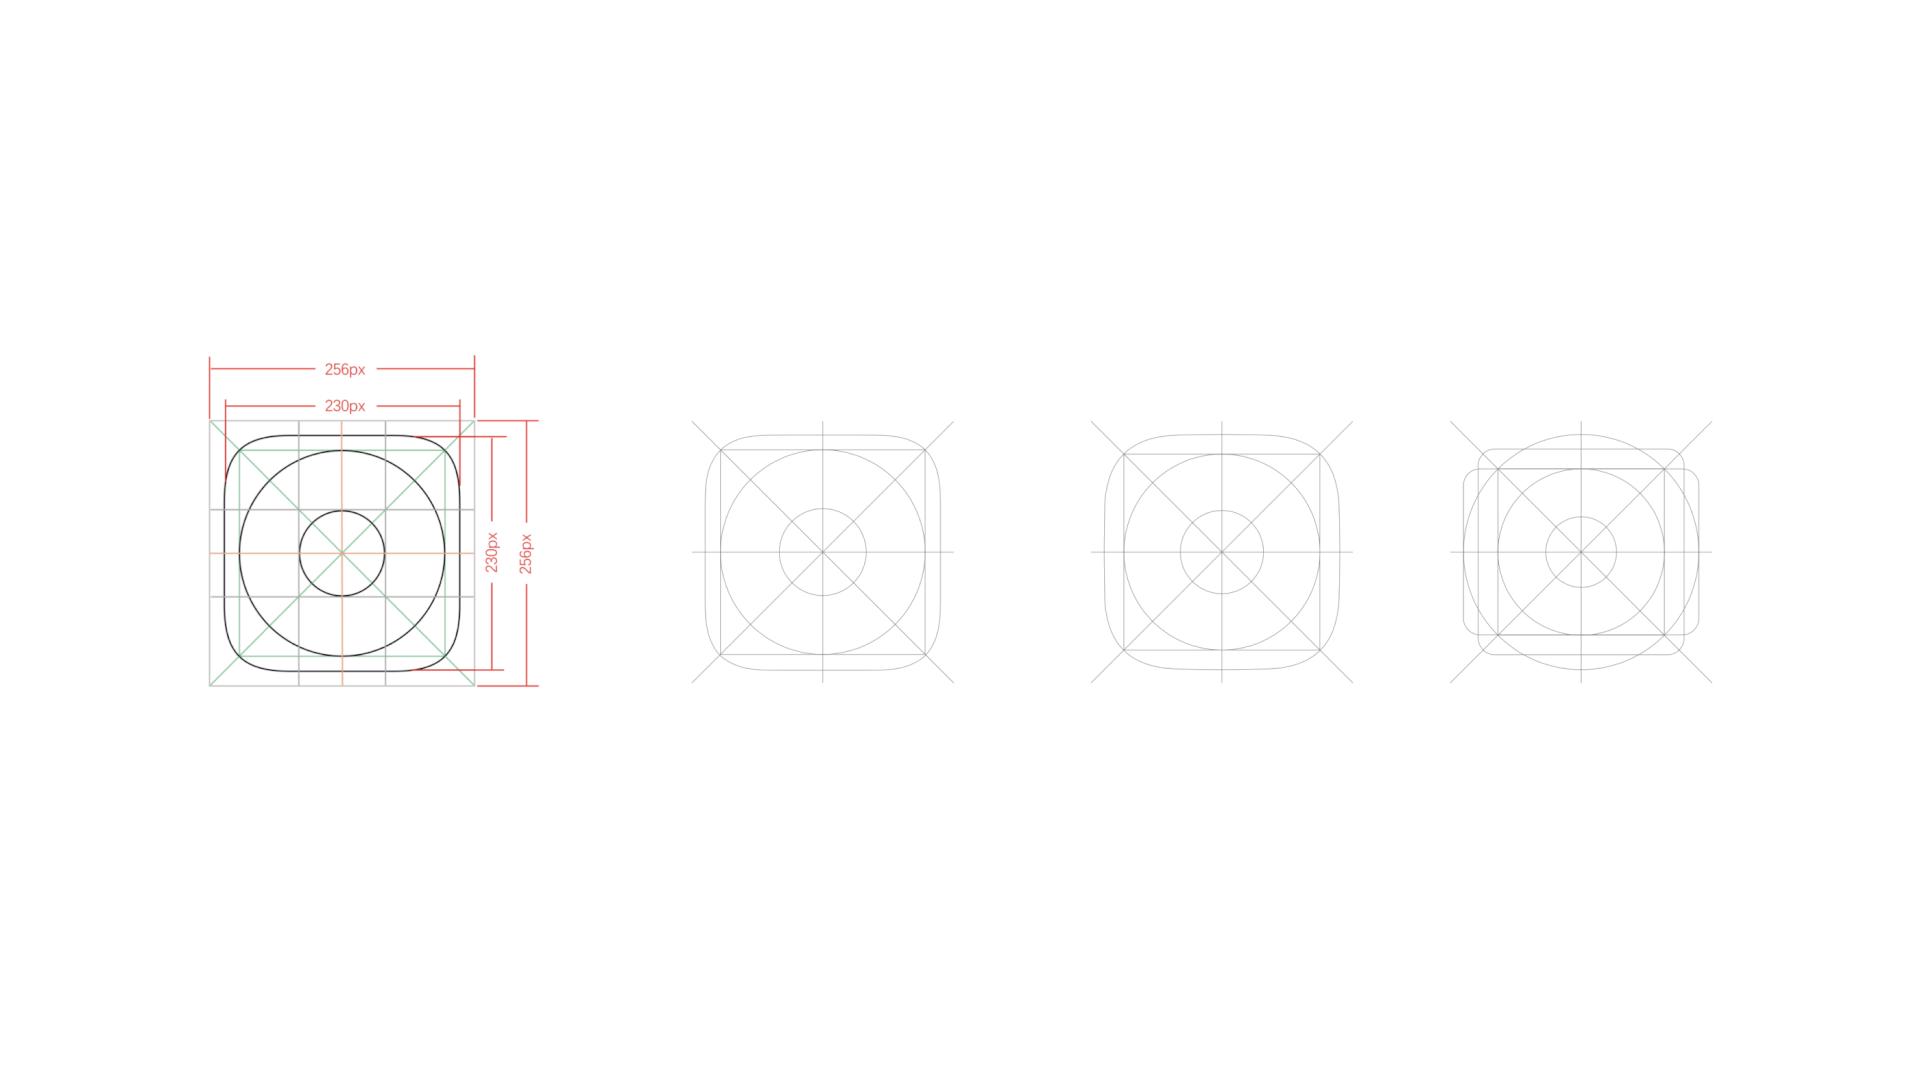 Tubik Studio 是怎么为华为定制整套 UI 图标的?